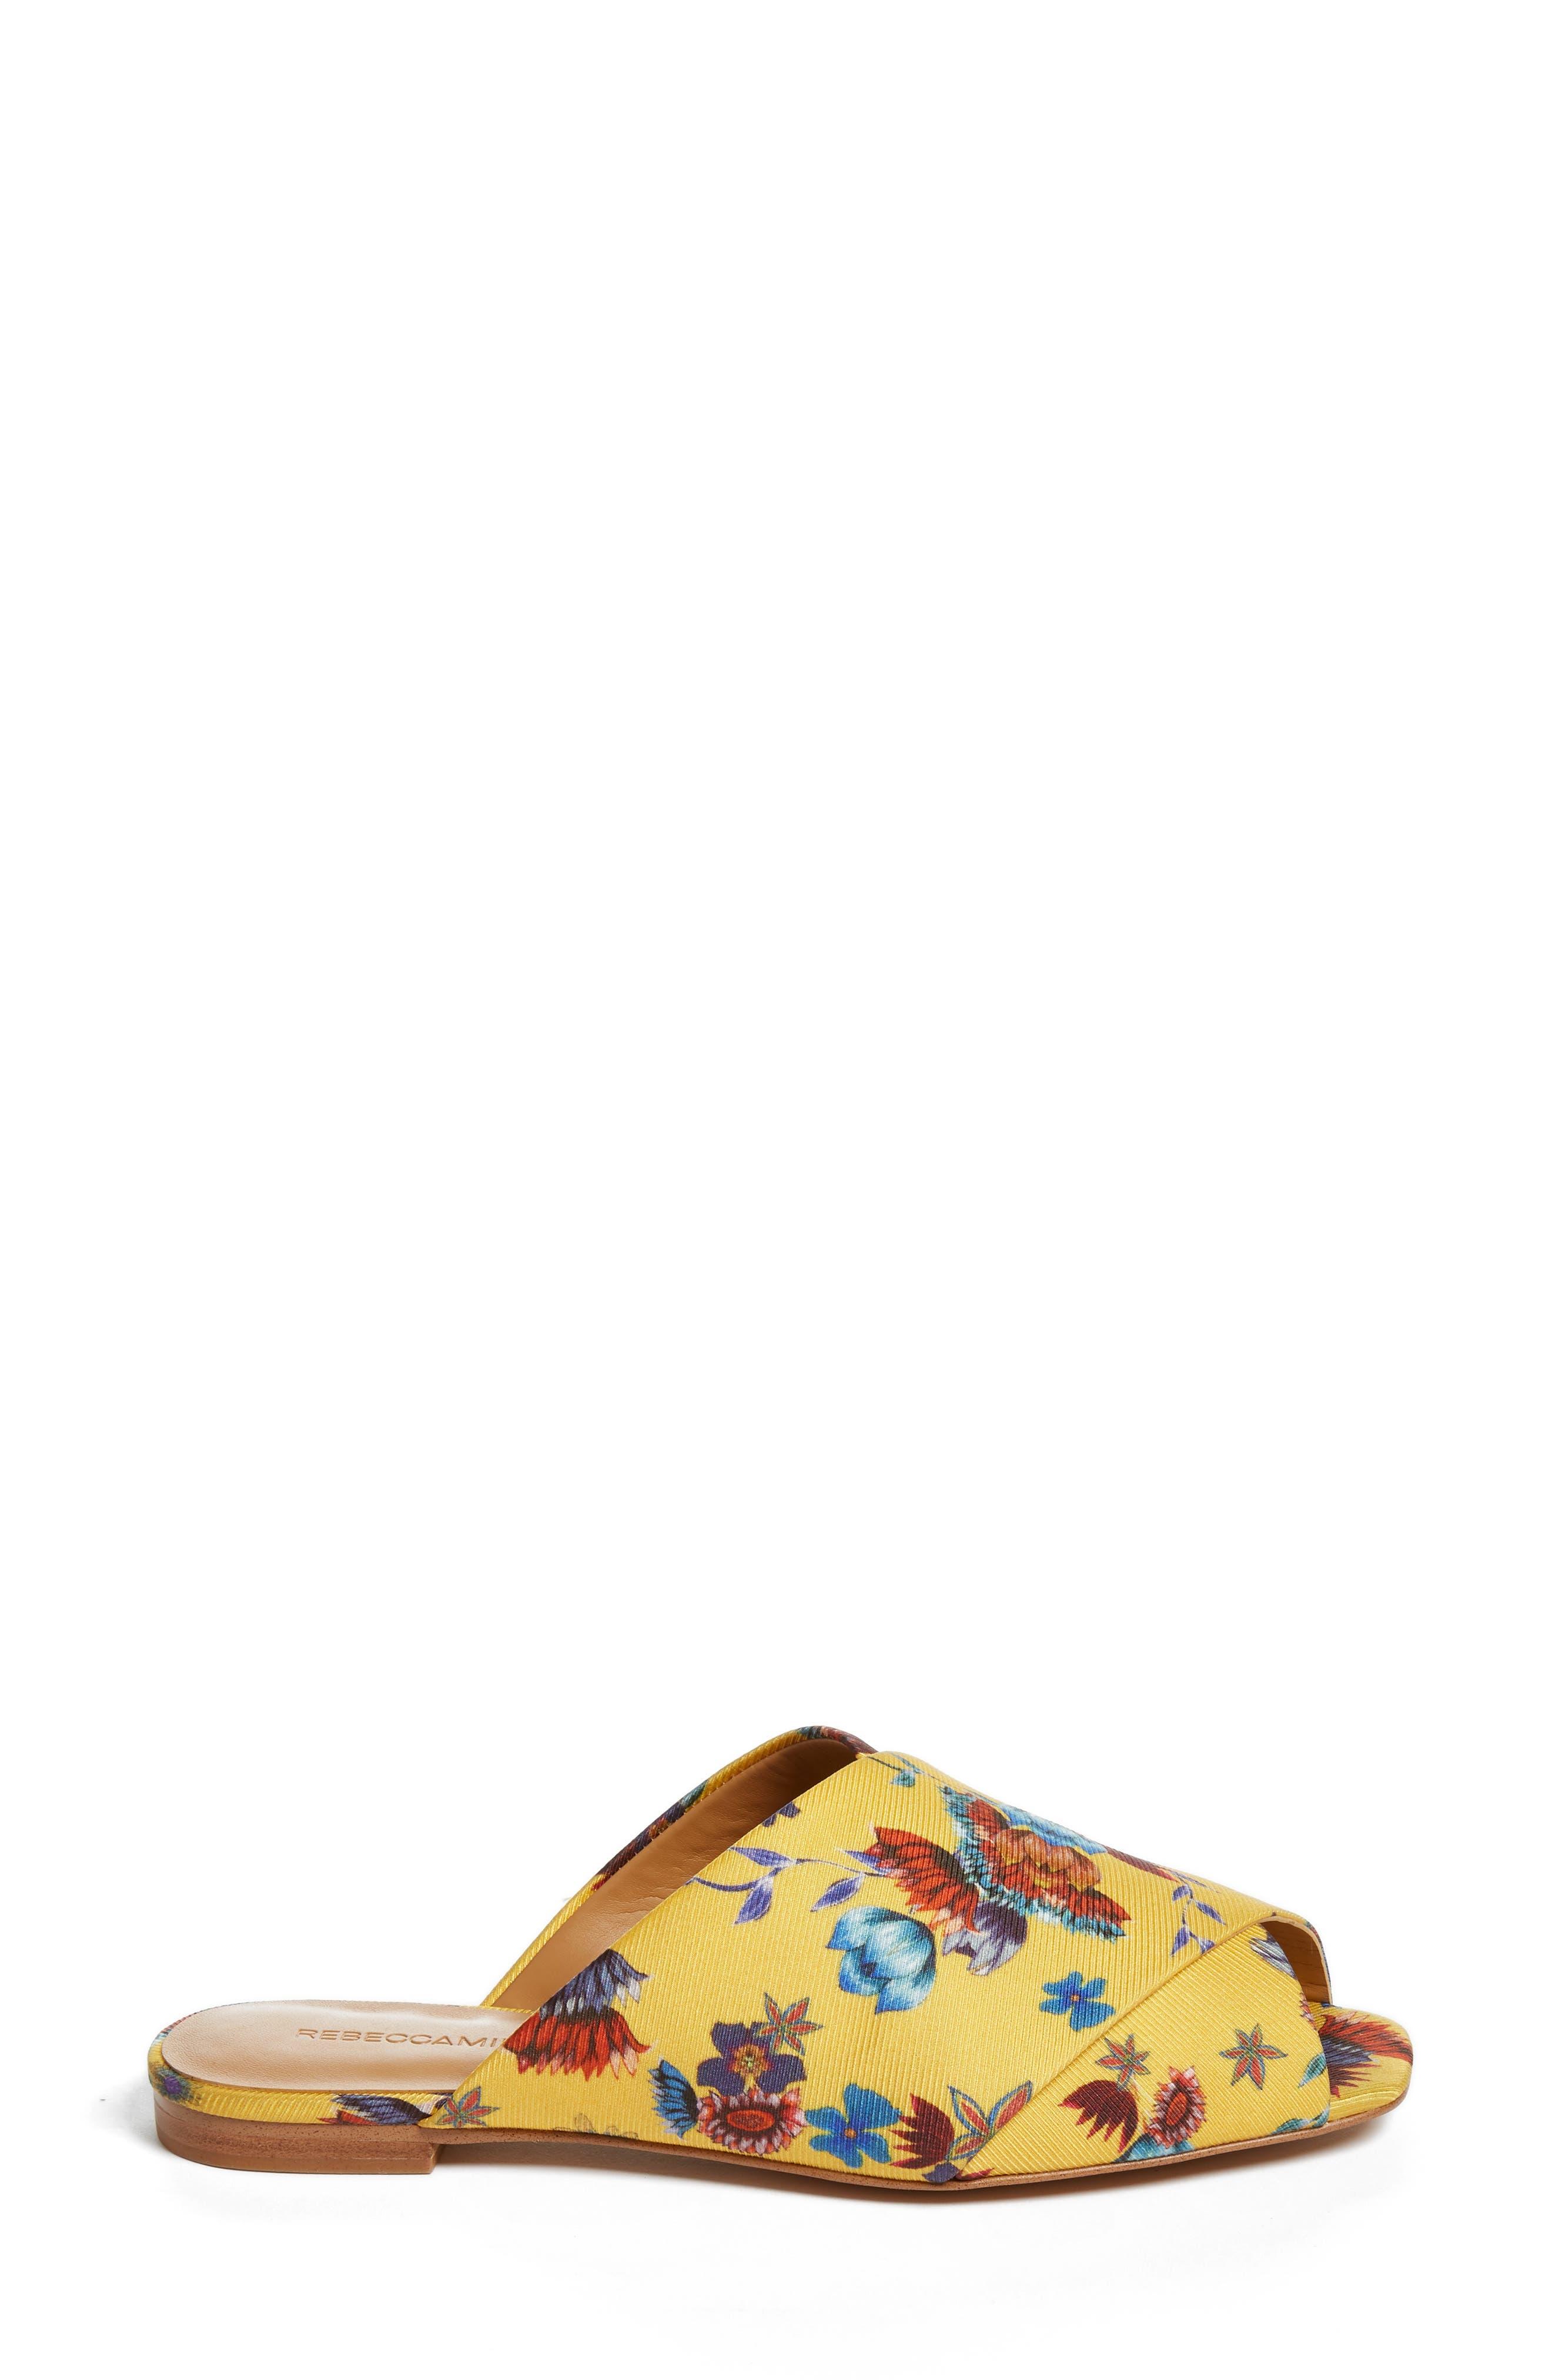 Anden Slide Sandal,                             Alternate thumbnail 3, color,                             Butterscotch Multi Print Silk